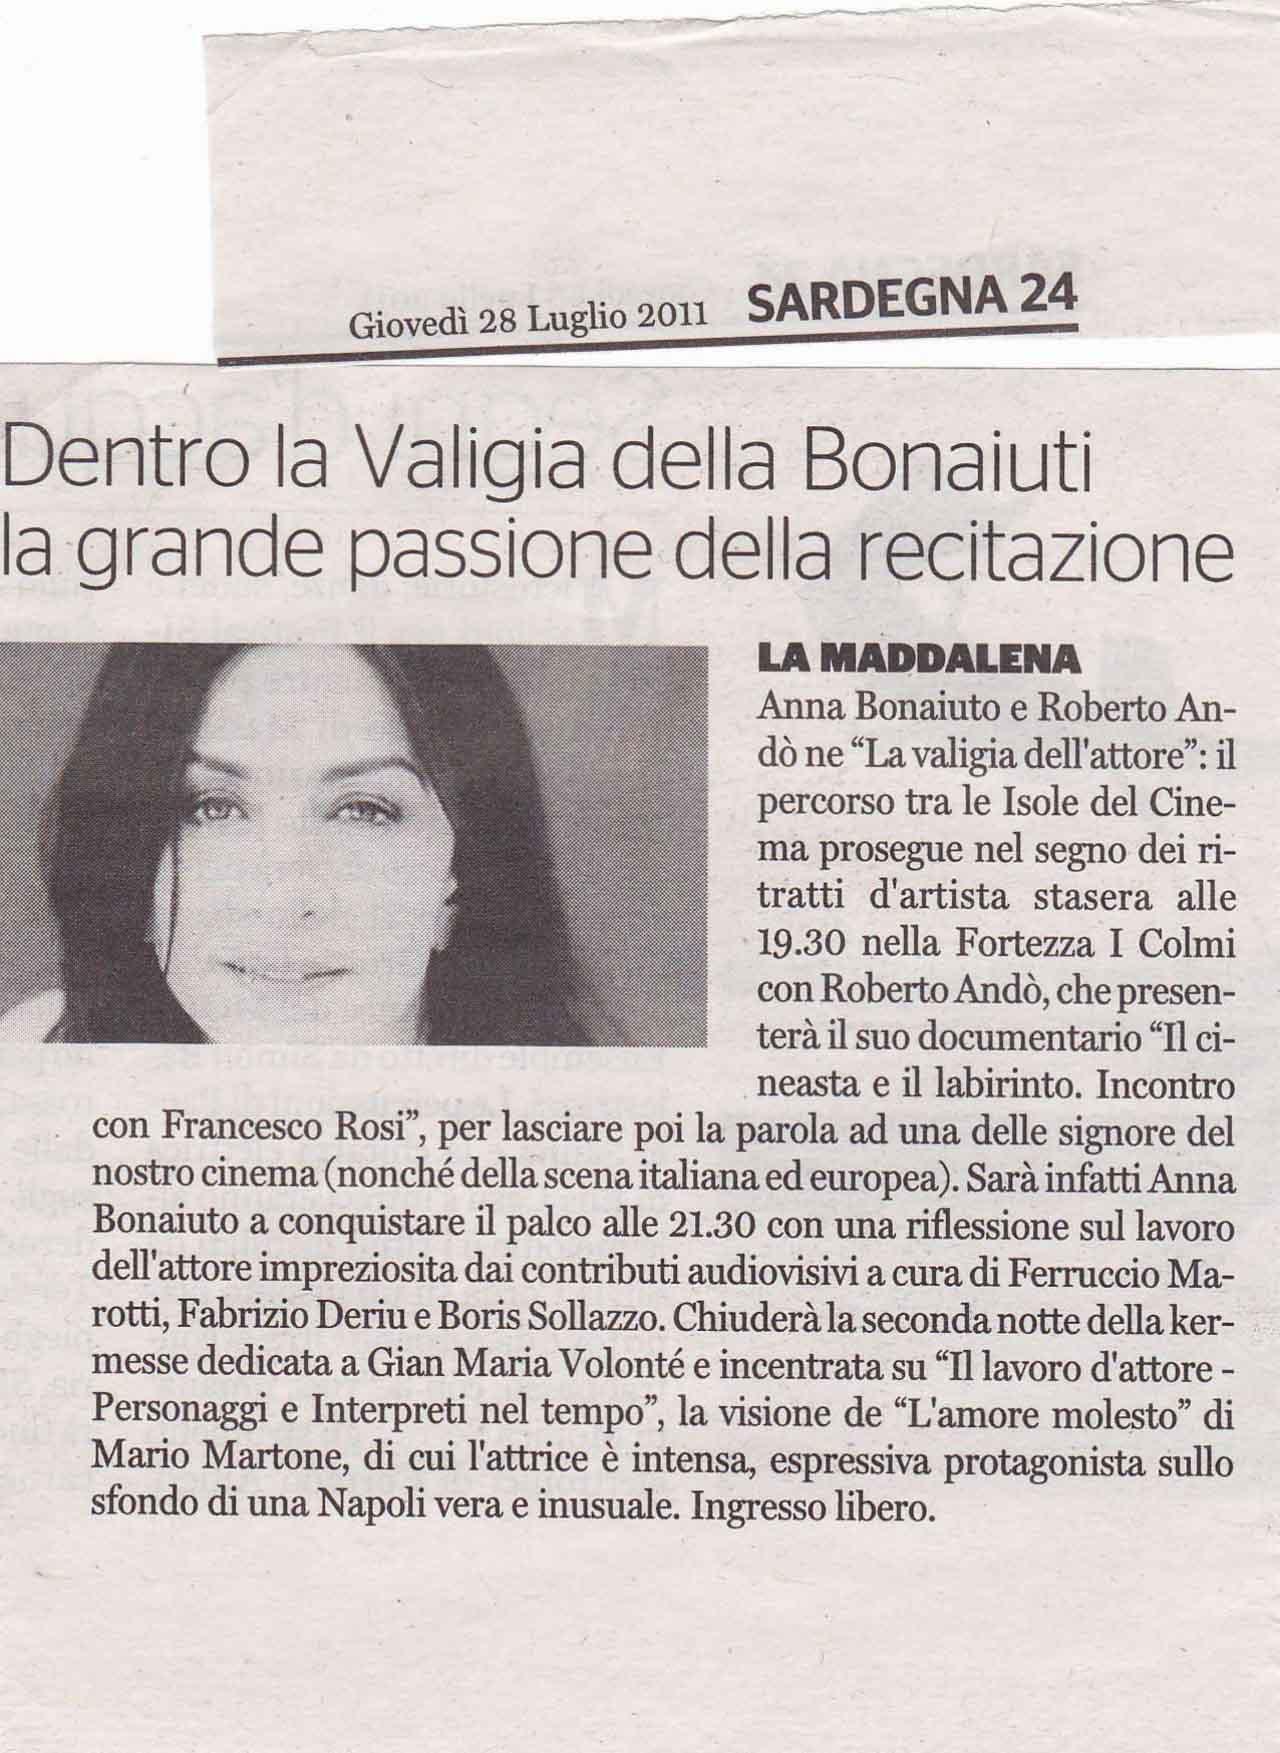 Sardegna24 del 28.07.11